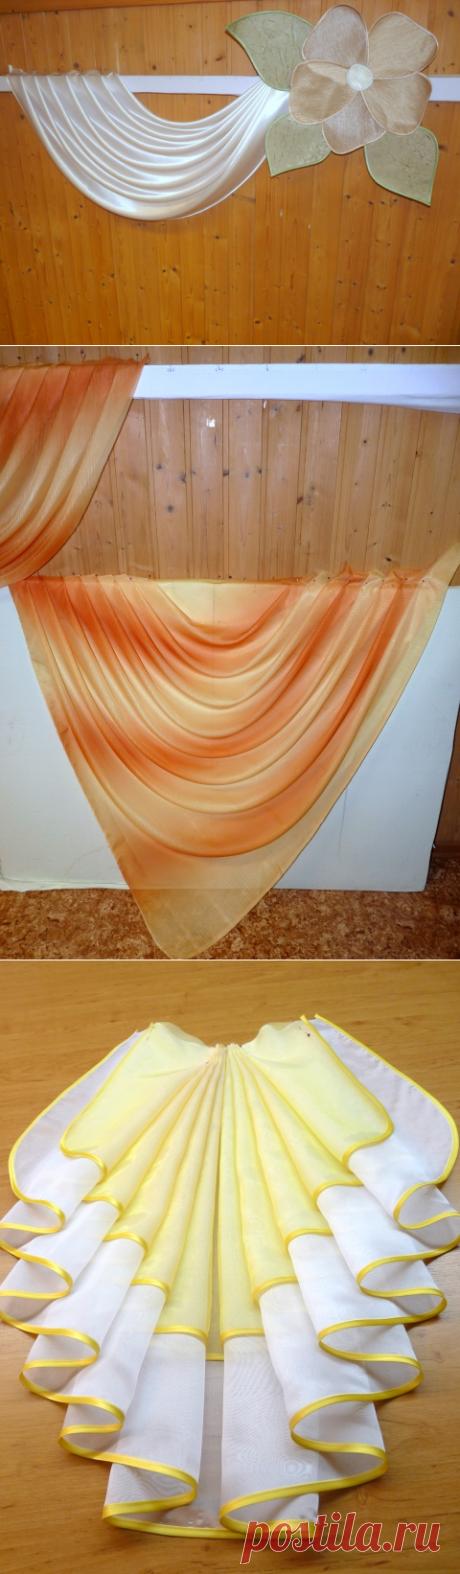 Как проутюжить складки на ламбрекене — img 2